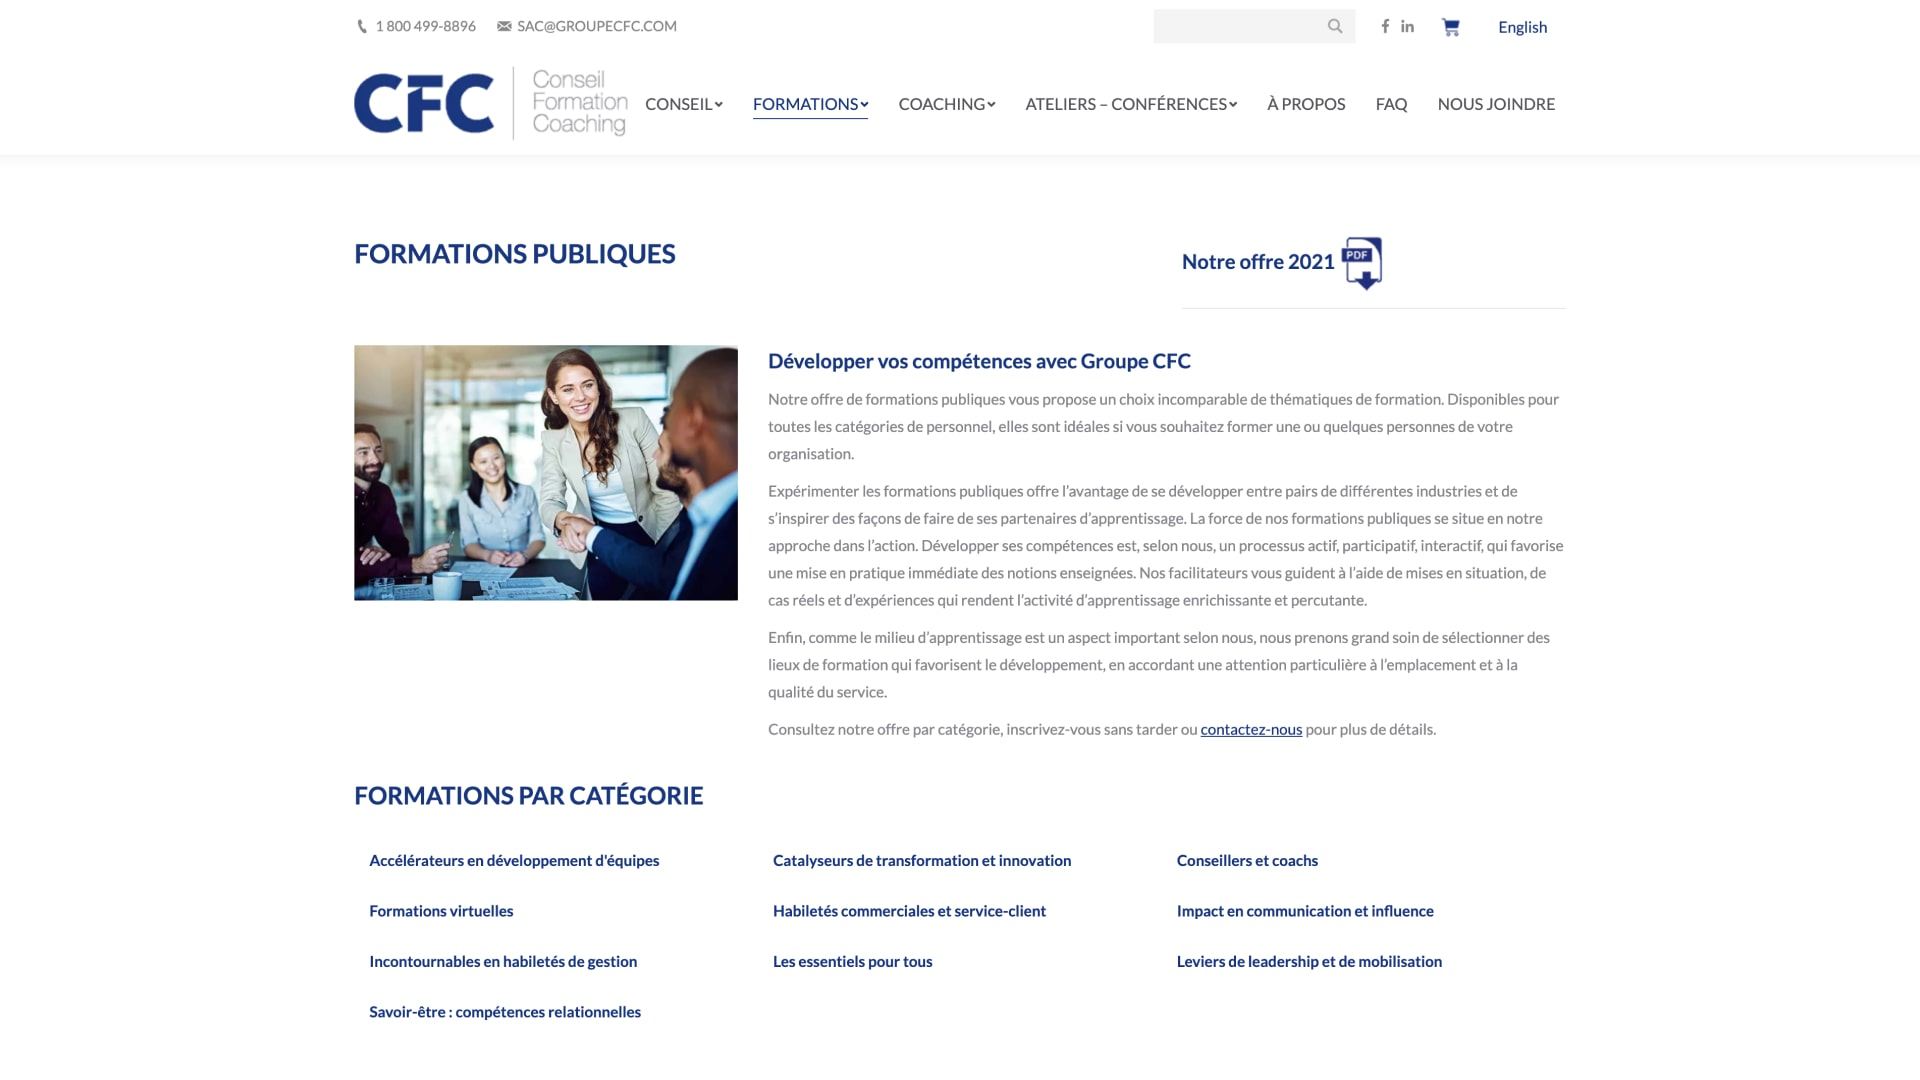 GroupeCFC-Formations-Publiques-Sidney-Malgras-UX-UI-Designer